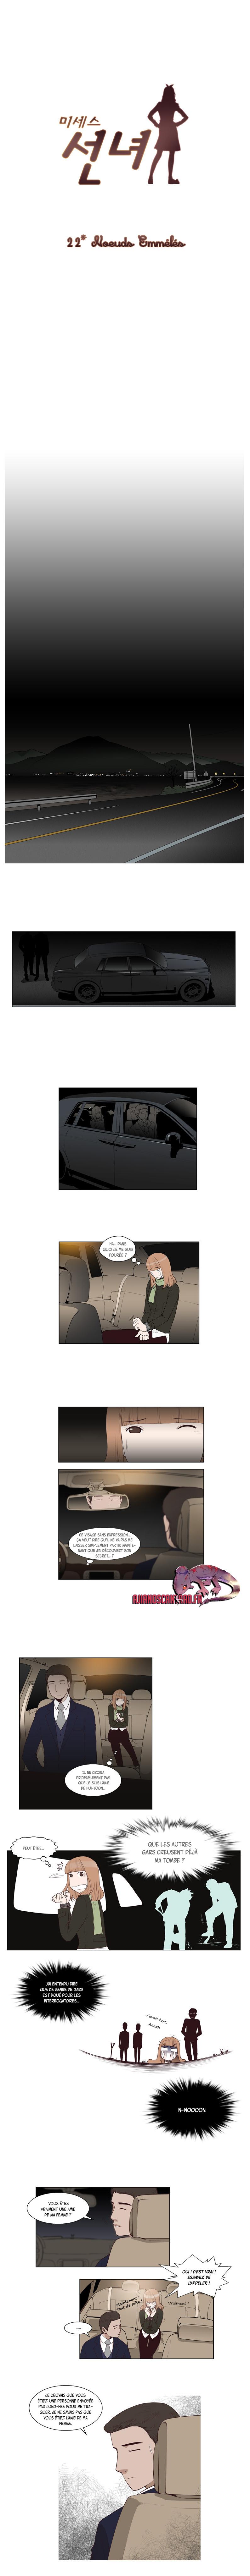 https://nine.mangadogs.com/fr_manga/pic1/63/639/33397/MrsAngel22VF_0_562.jpg Page 1